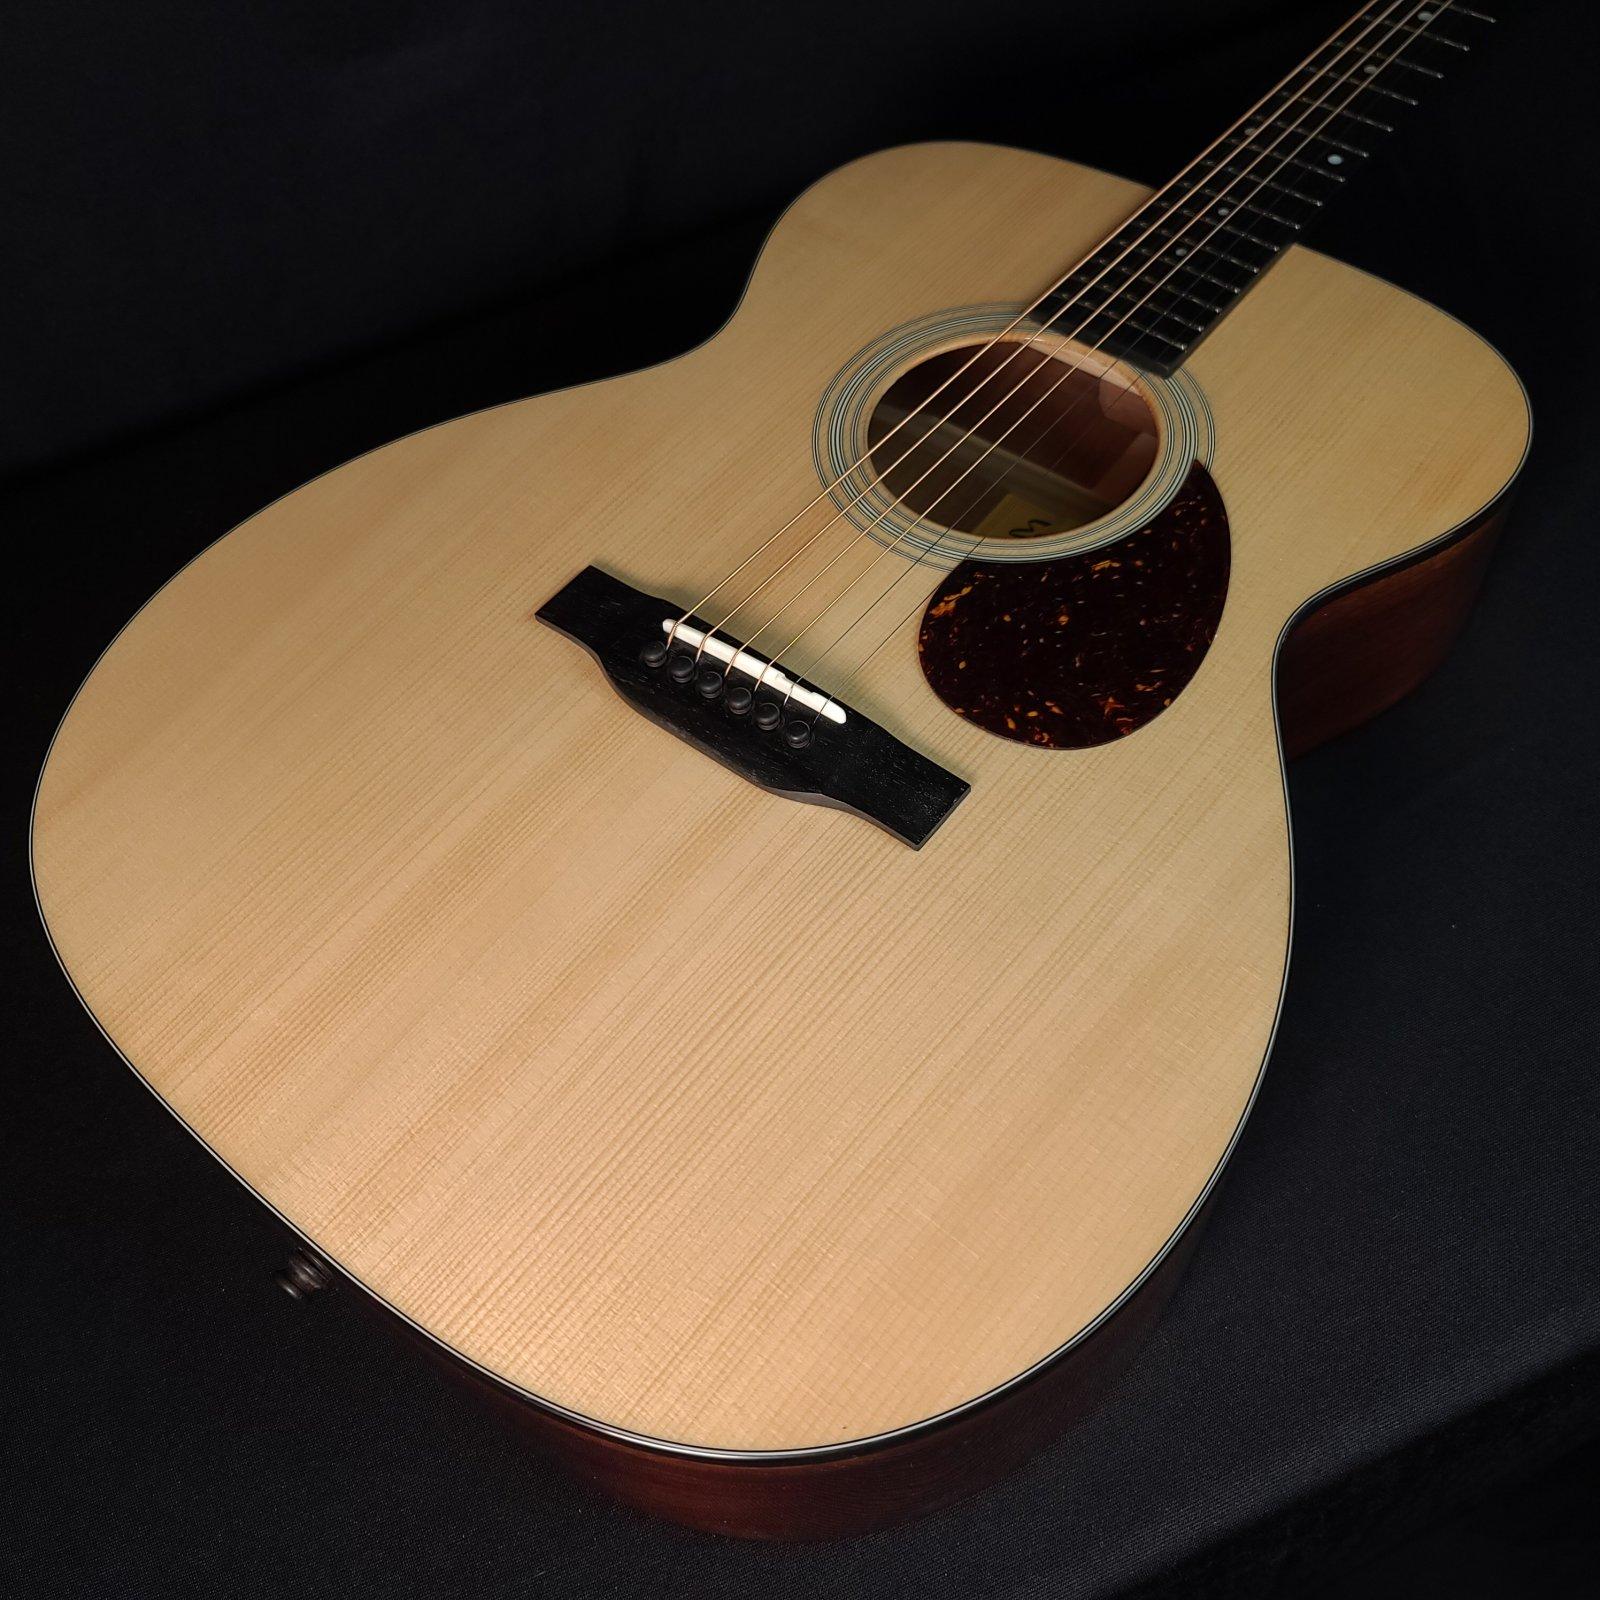 Eastman E10OM Acoustic OM Guitar with Hard Shell Case 9401